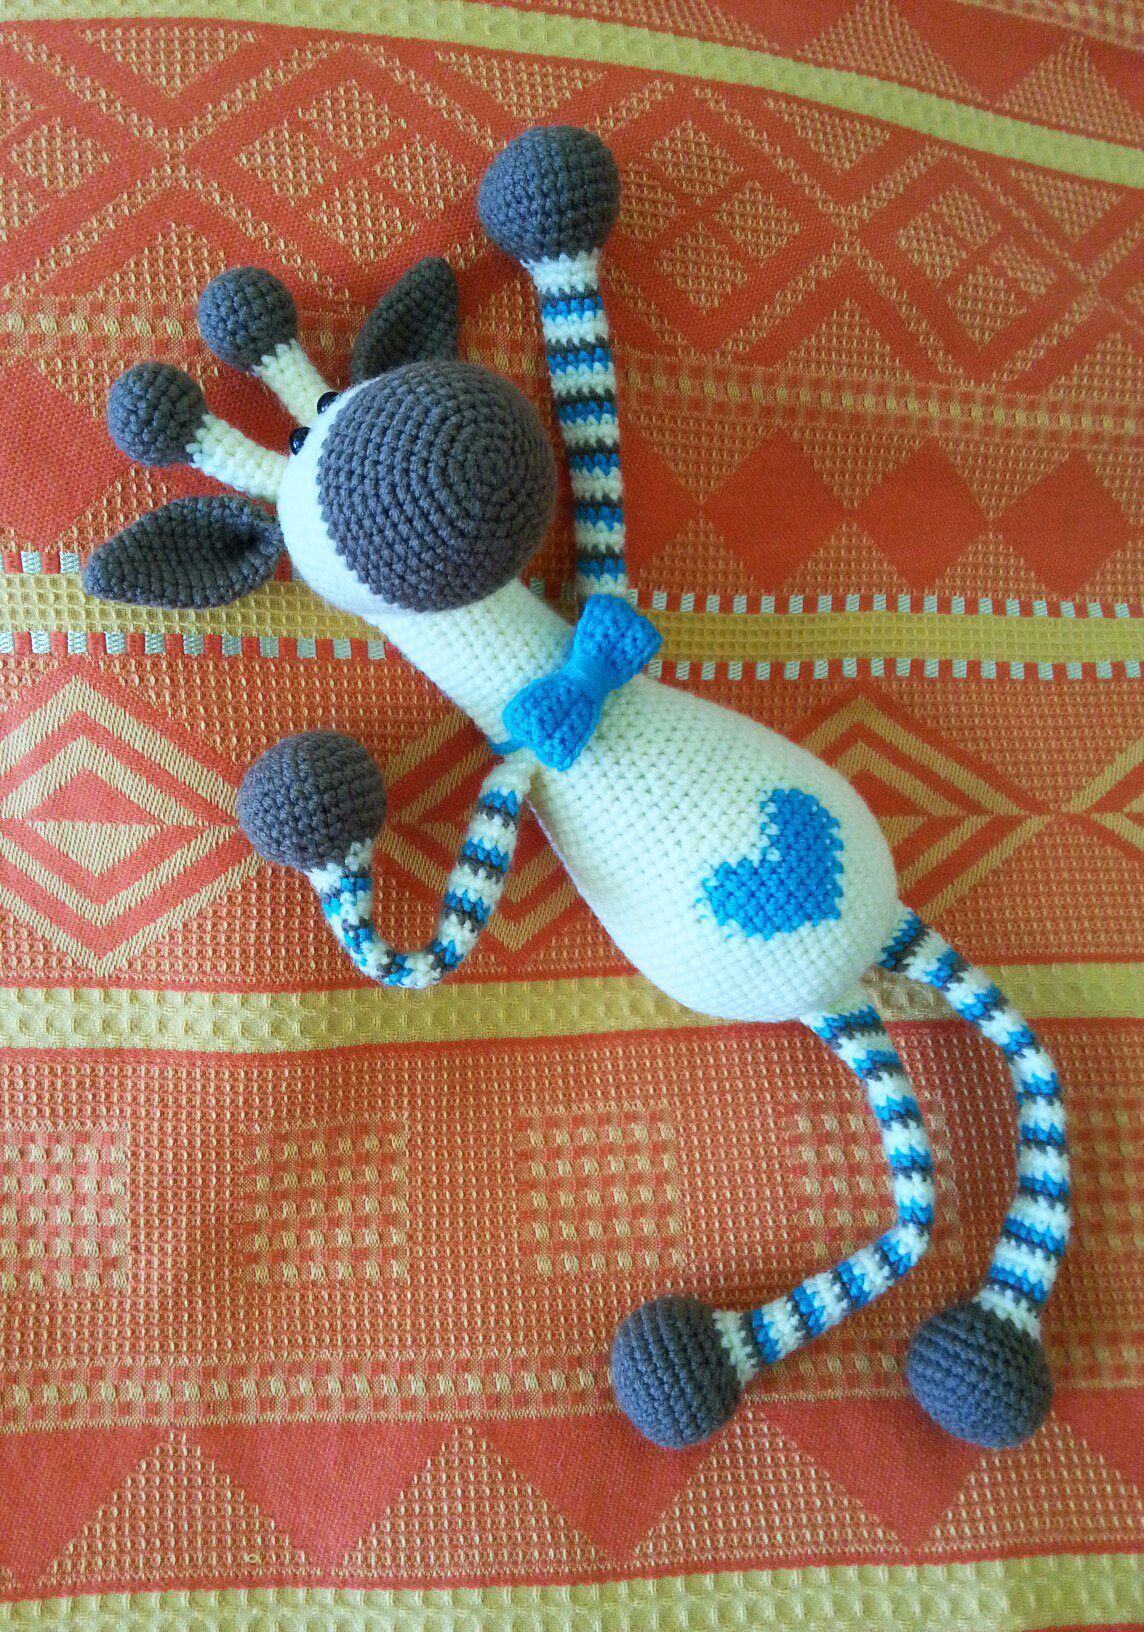 Giraffe baby rattle crochet pattern | Giraffe crochet, Crochet ... | 1632x1144